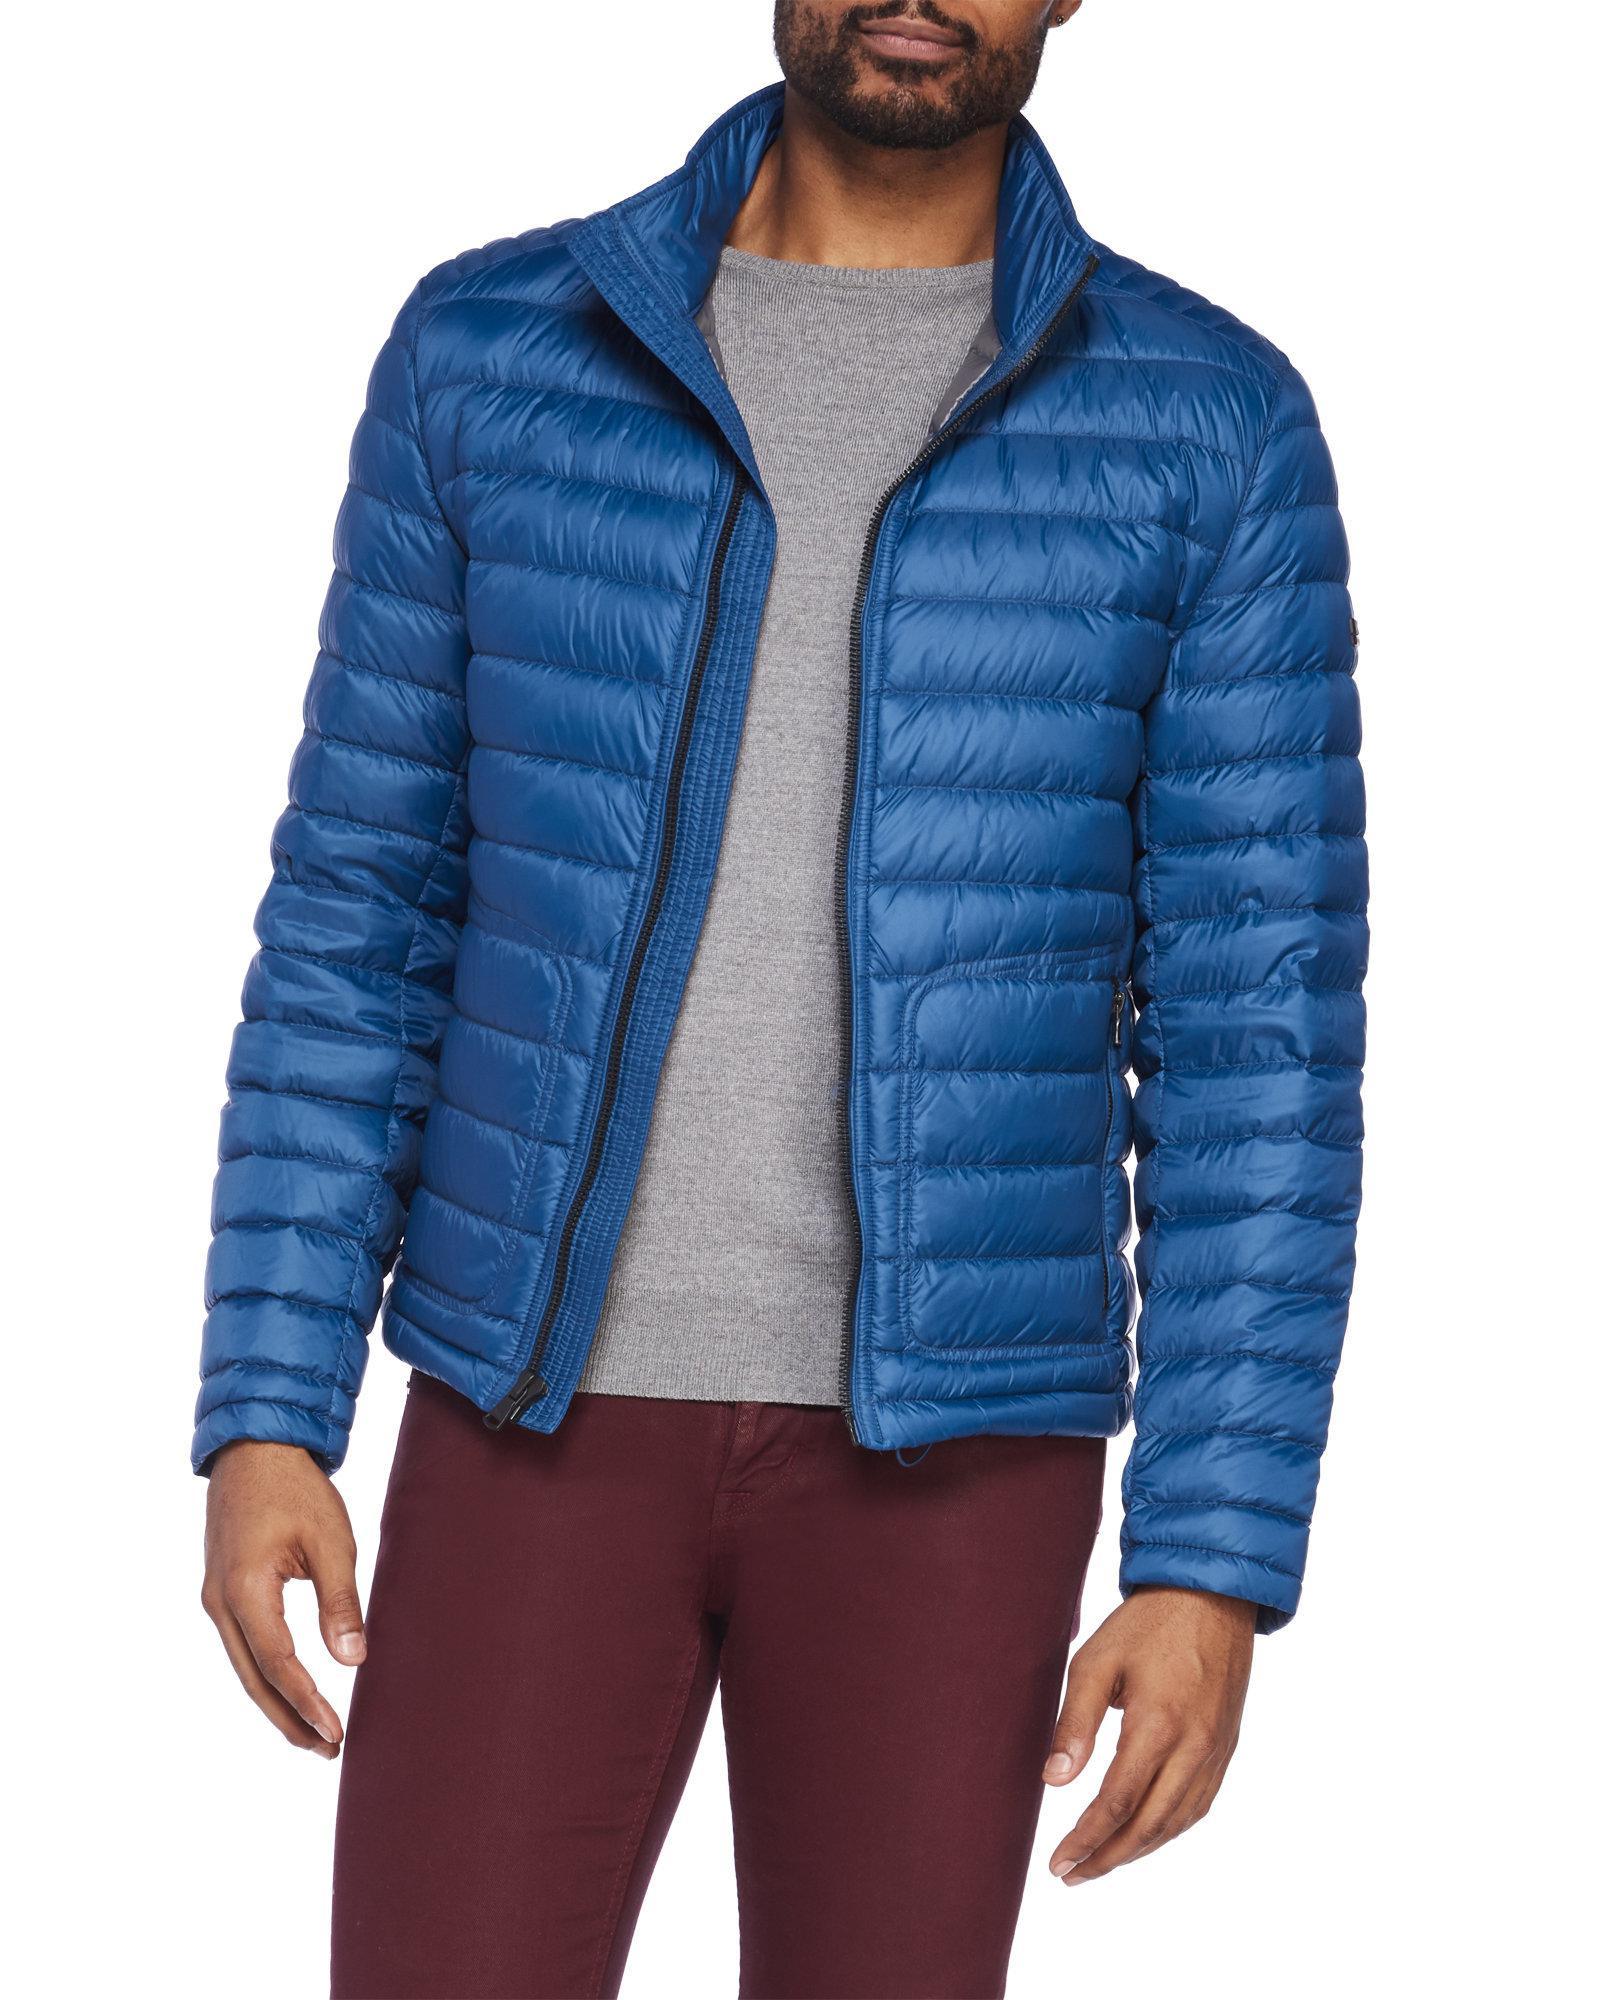 Michael kors packable down jacket men's